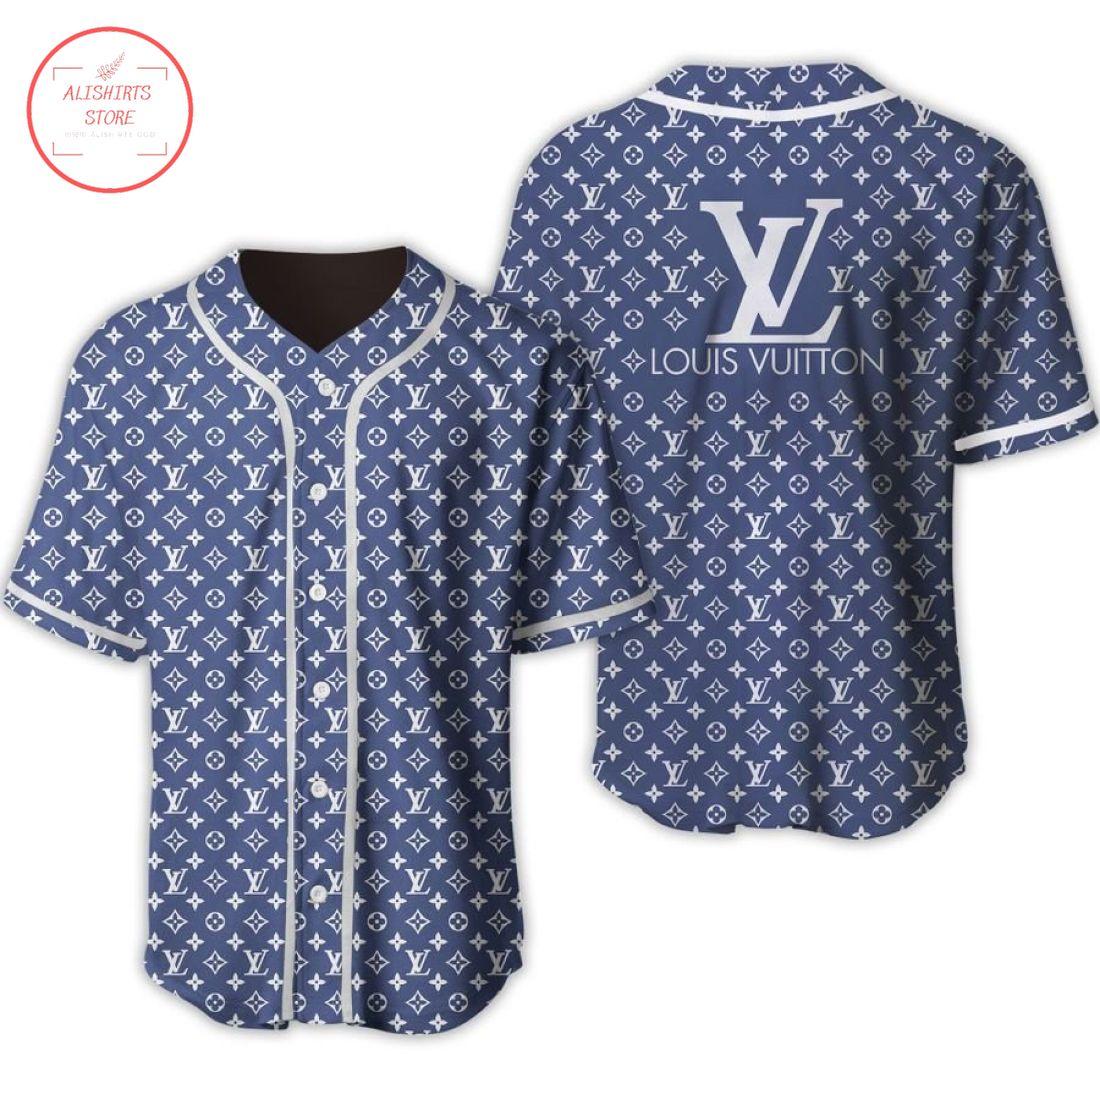 Louis Vuitton Luxury Brand Baseball Jersey